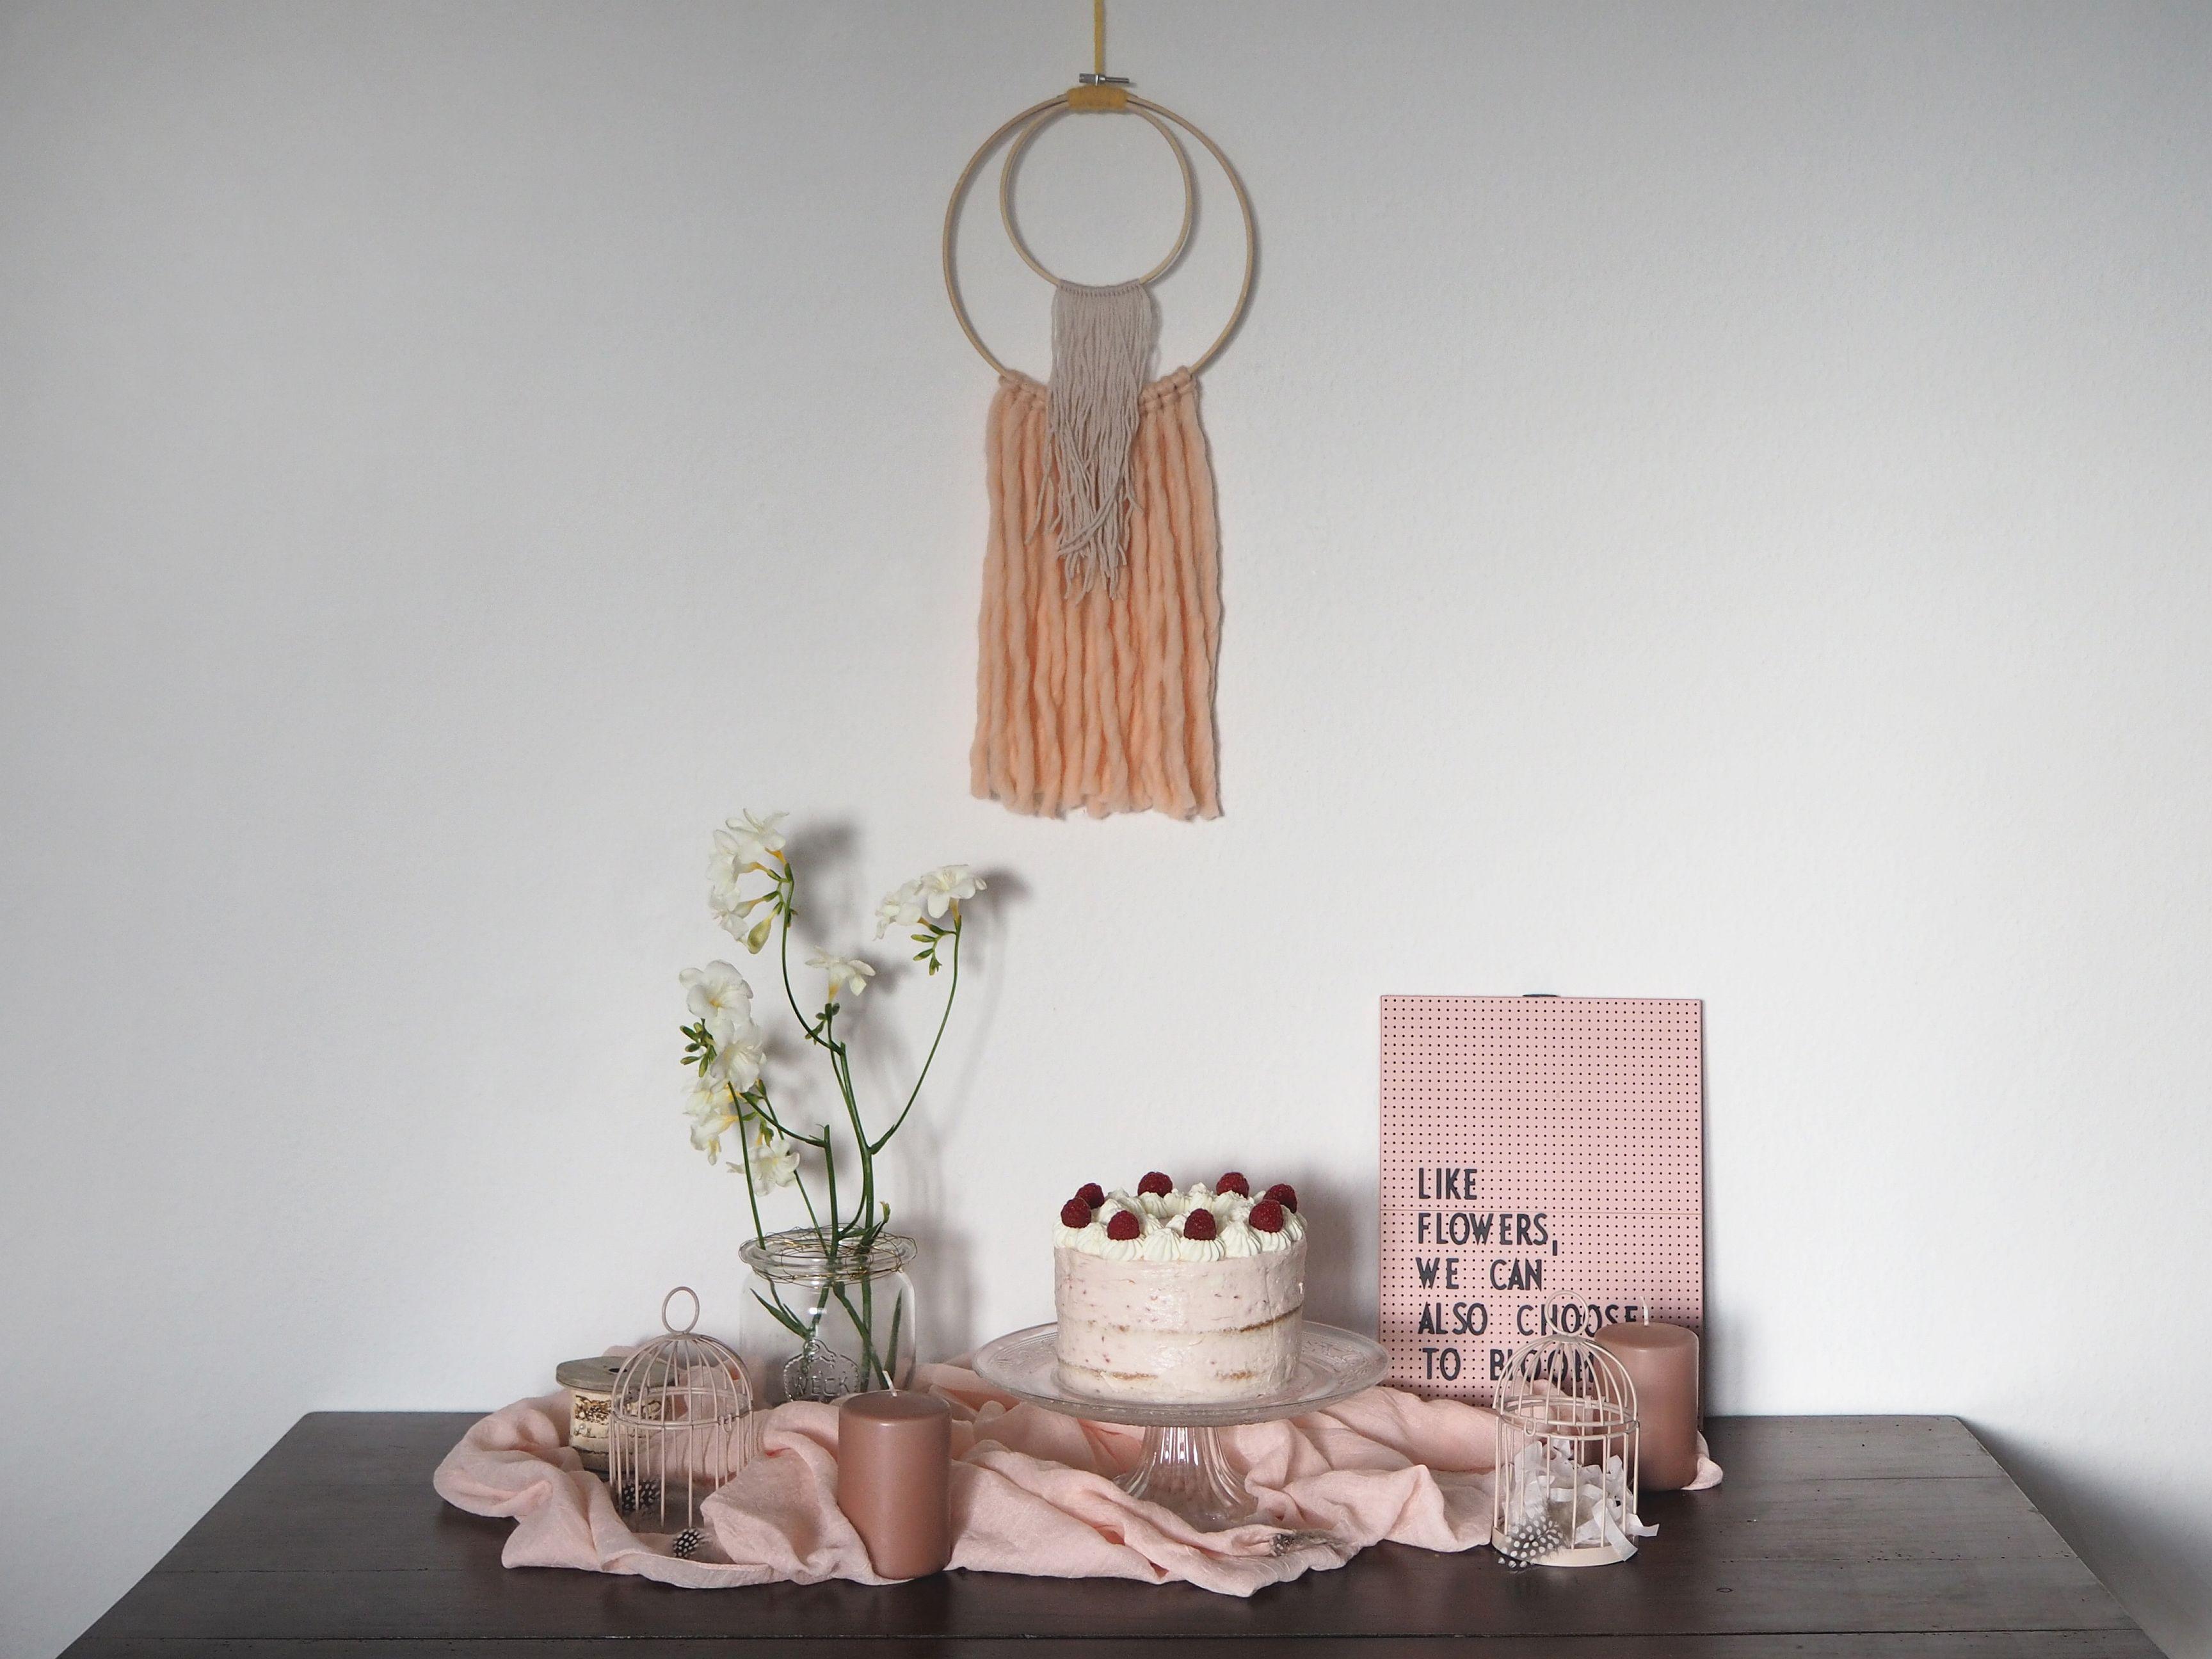 2018-04-skoen-och-kreativ-food-glad-pask-rhabarber-himbeer-toertchen-mit-crunch-zu-ostern (2)